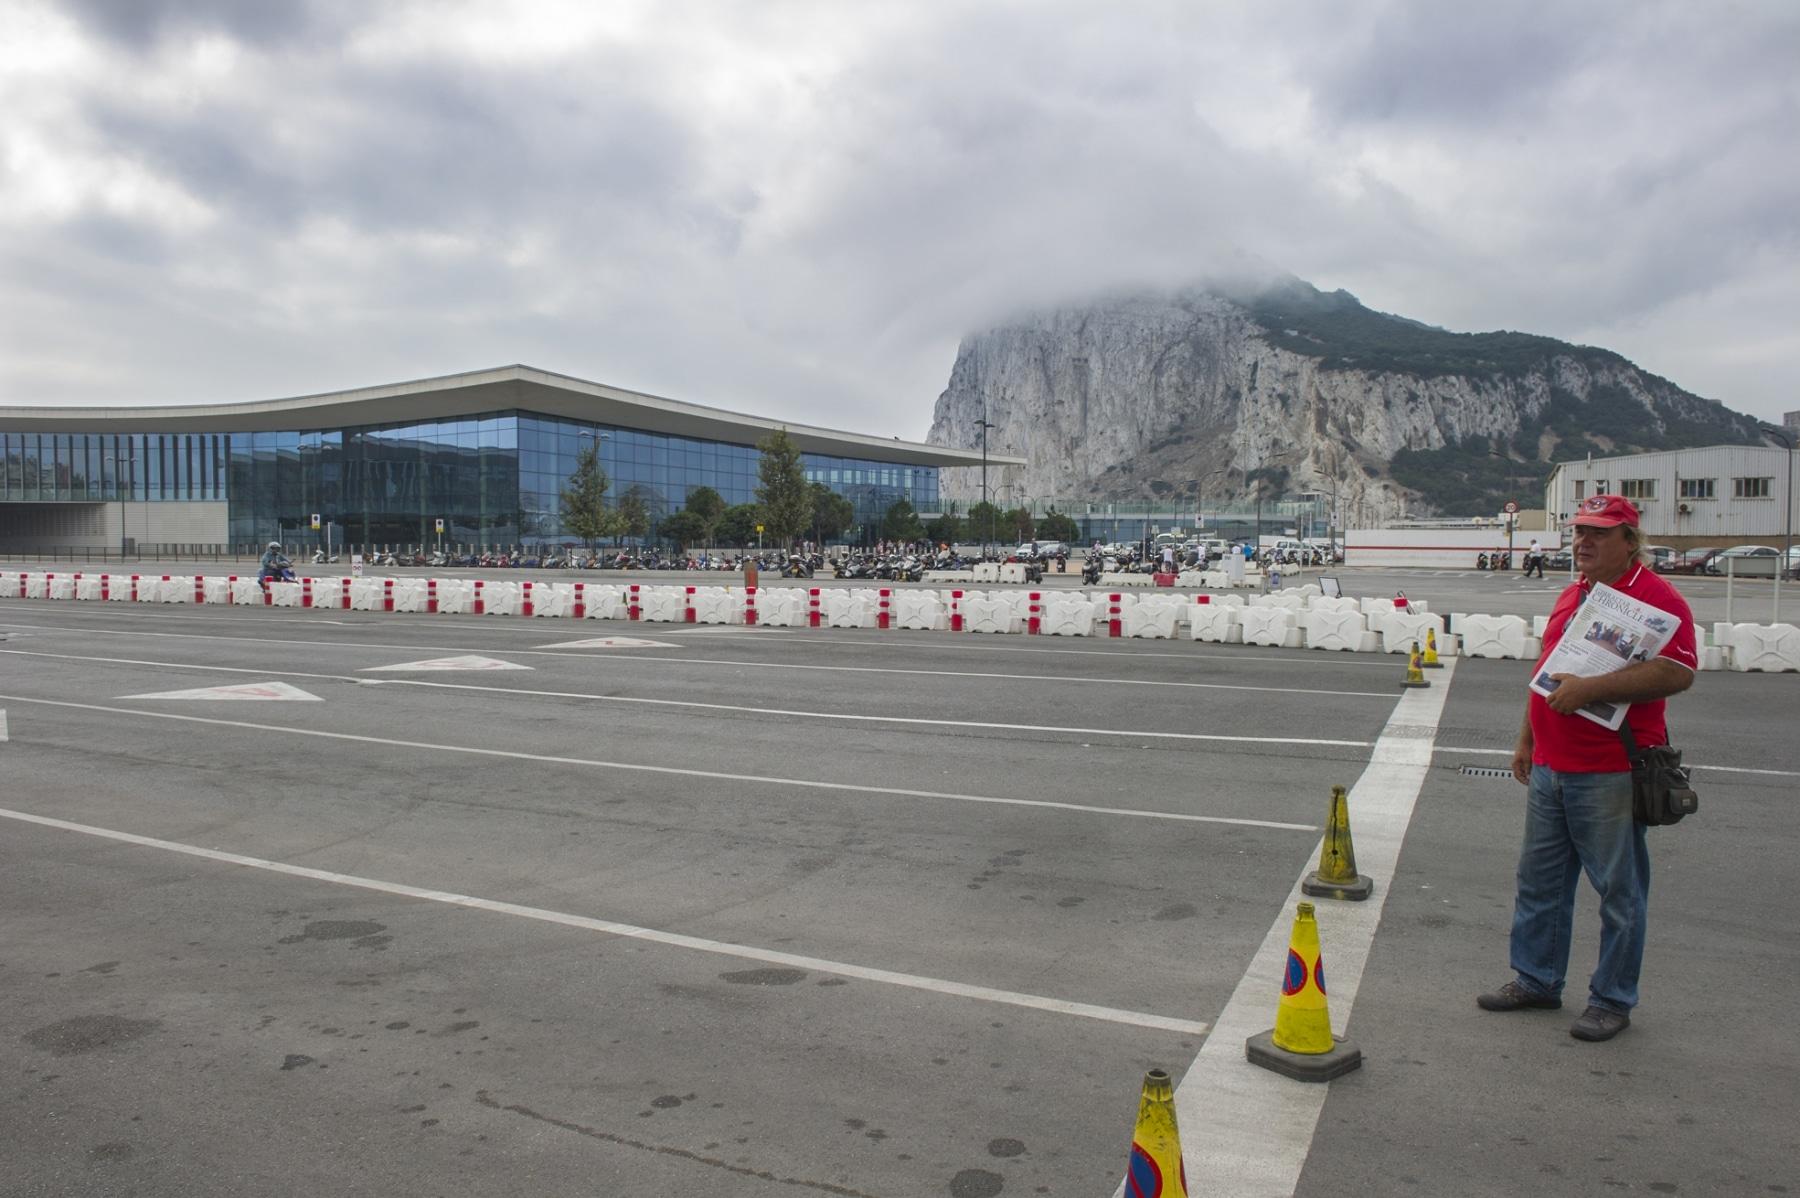 Gibraltar, 20 septiembre 2013. Cola de salida de Gibraltar inexistente a medio día. Tan sólo el vendedor de periódicos. AFP PHOTO / MARCOS MORENO